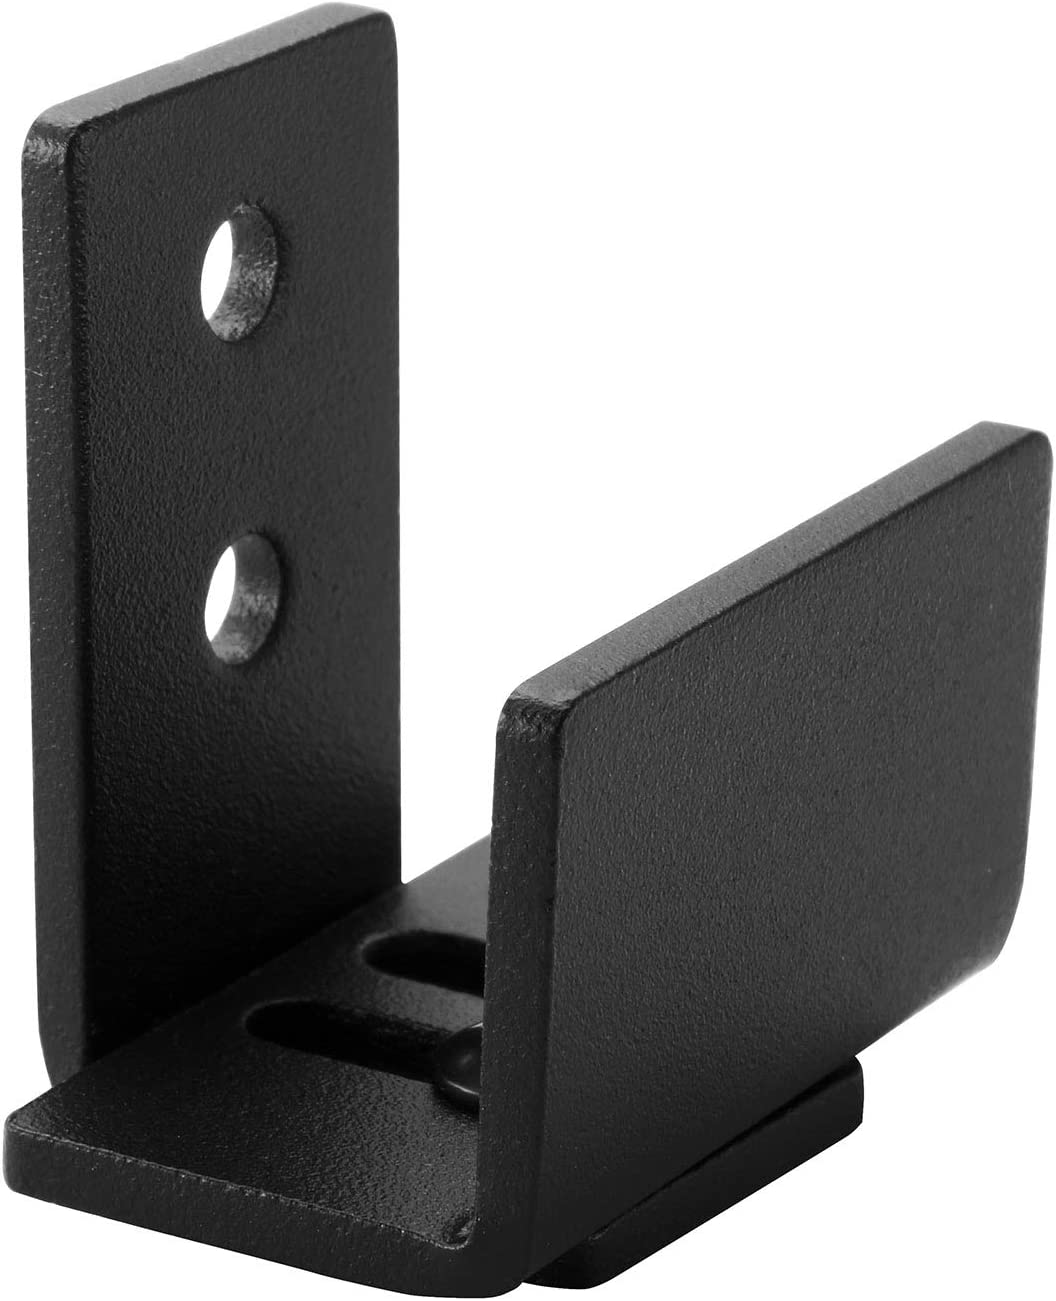 EaseLife Sturdy Sliding Barn Door Hardware Floor Guide,U Shape,Adjustable Fit Distance,Flexible Mount System,for Door & Cabinet,1 Pcs